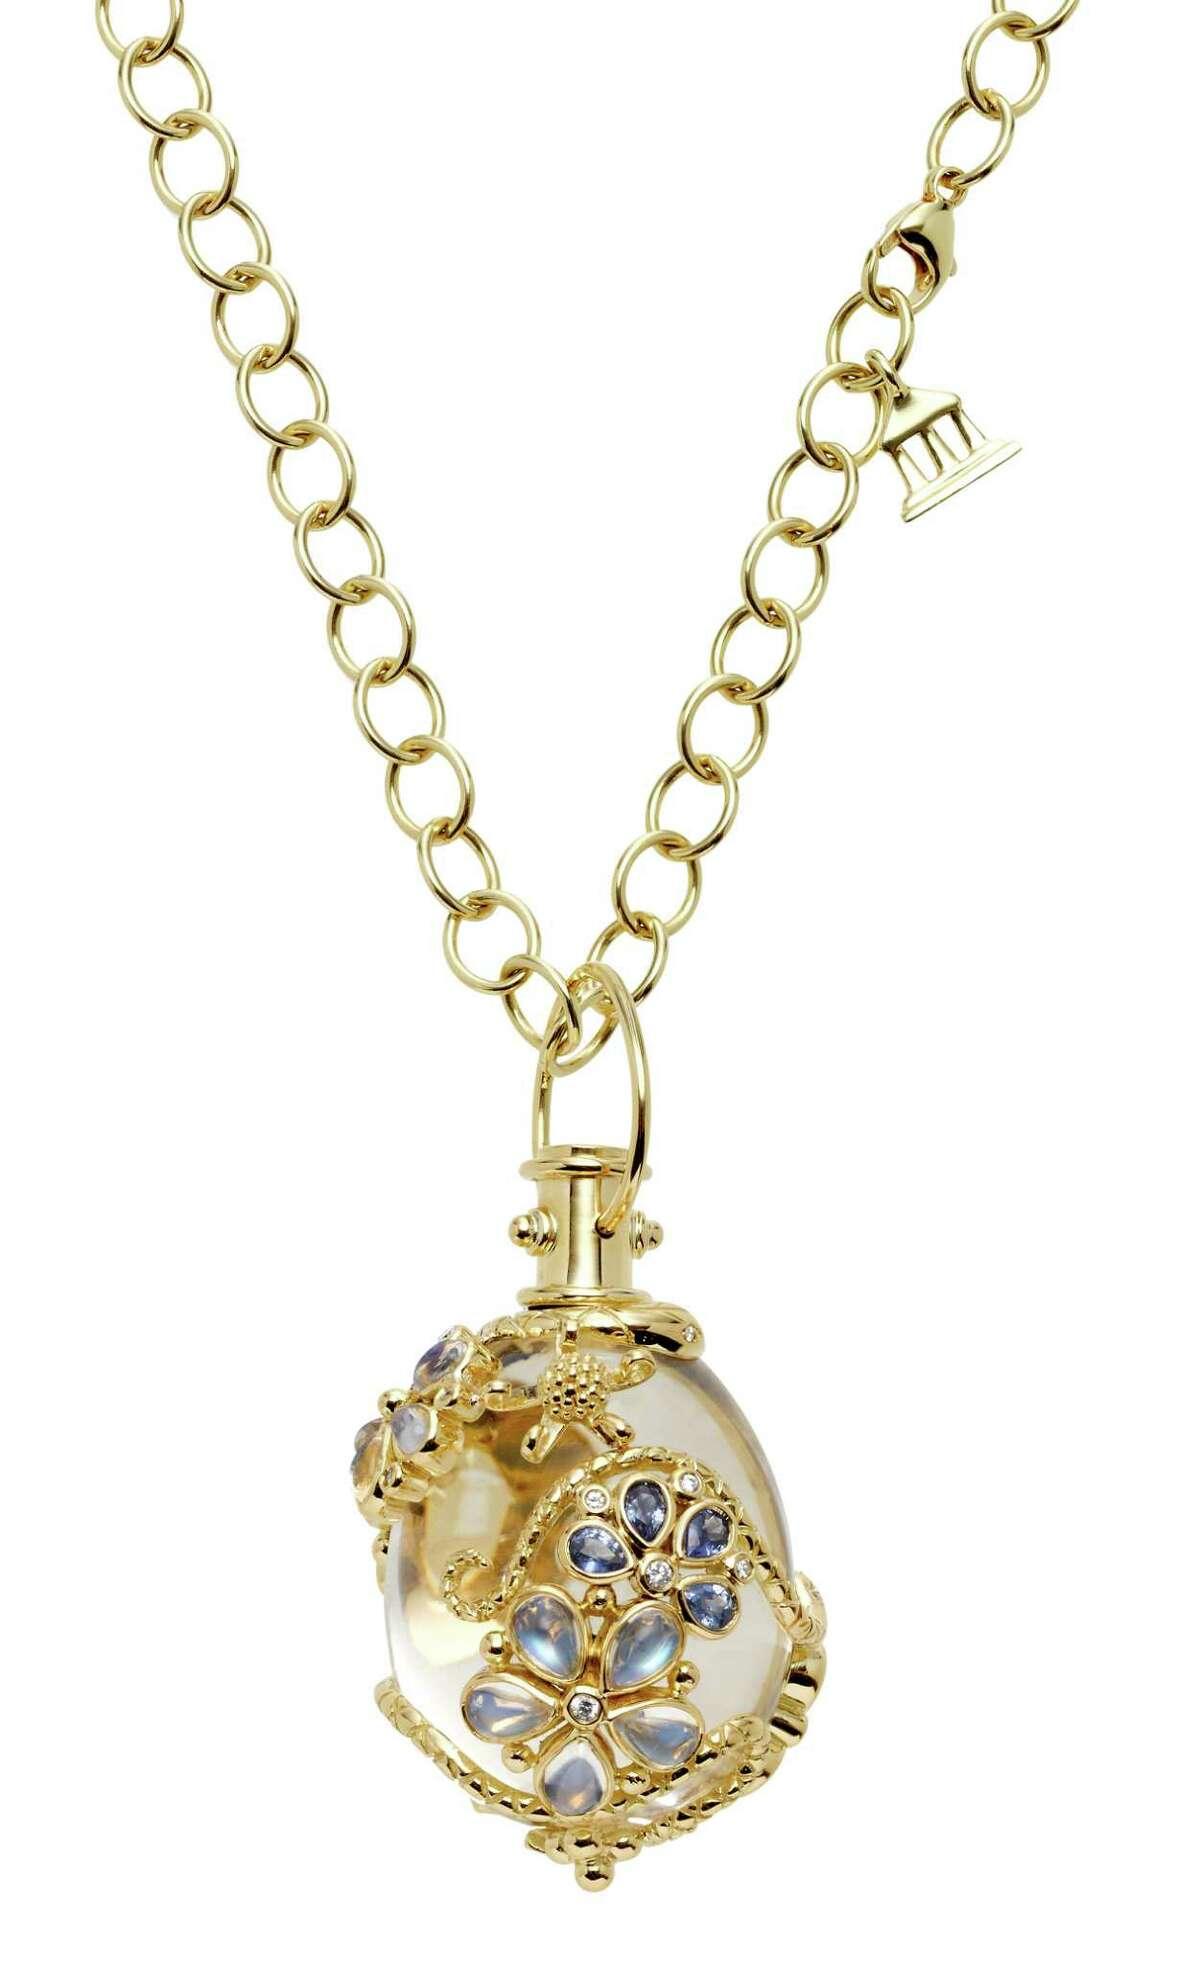 18K Flower Serpent Amulet with rock crystal, royal blue moonstone, blue sapphire, tsavorite and diamondbyTemple St. Clair, $19,500, at Saks Fifth Avenue and Deutsch & Deutsch